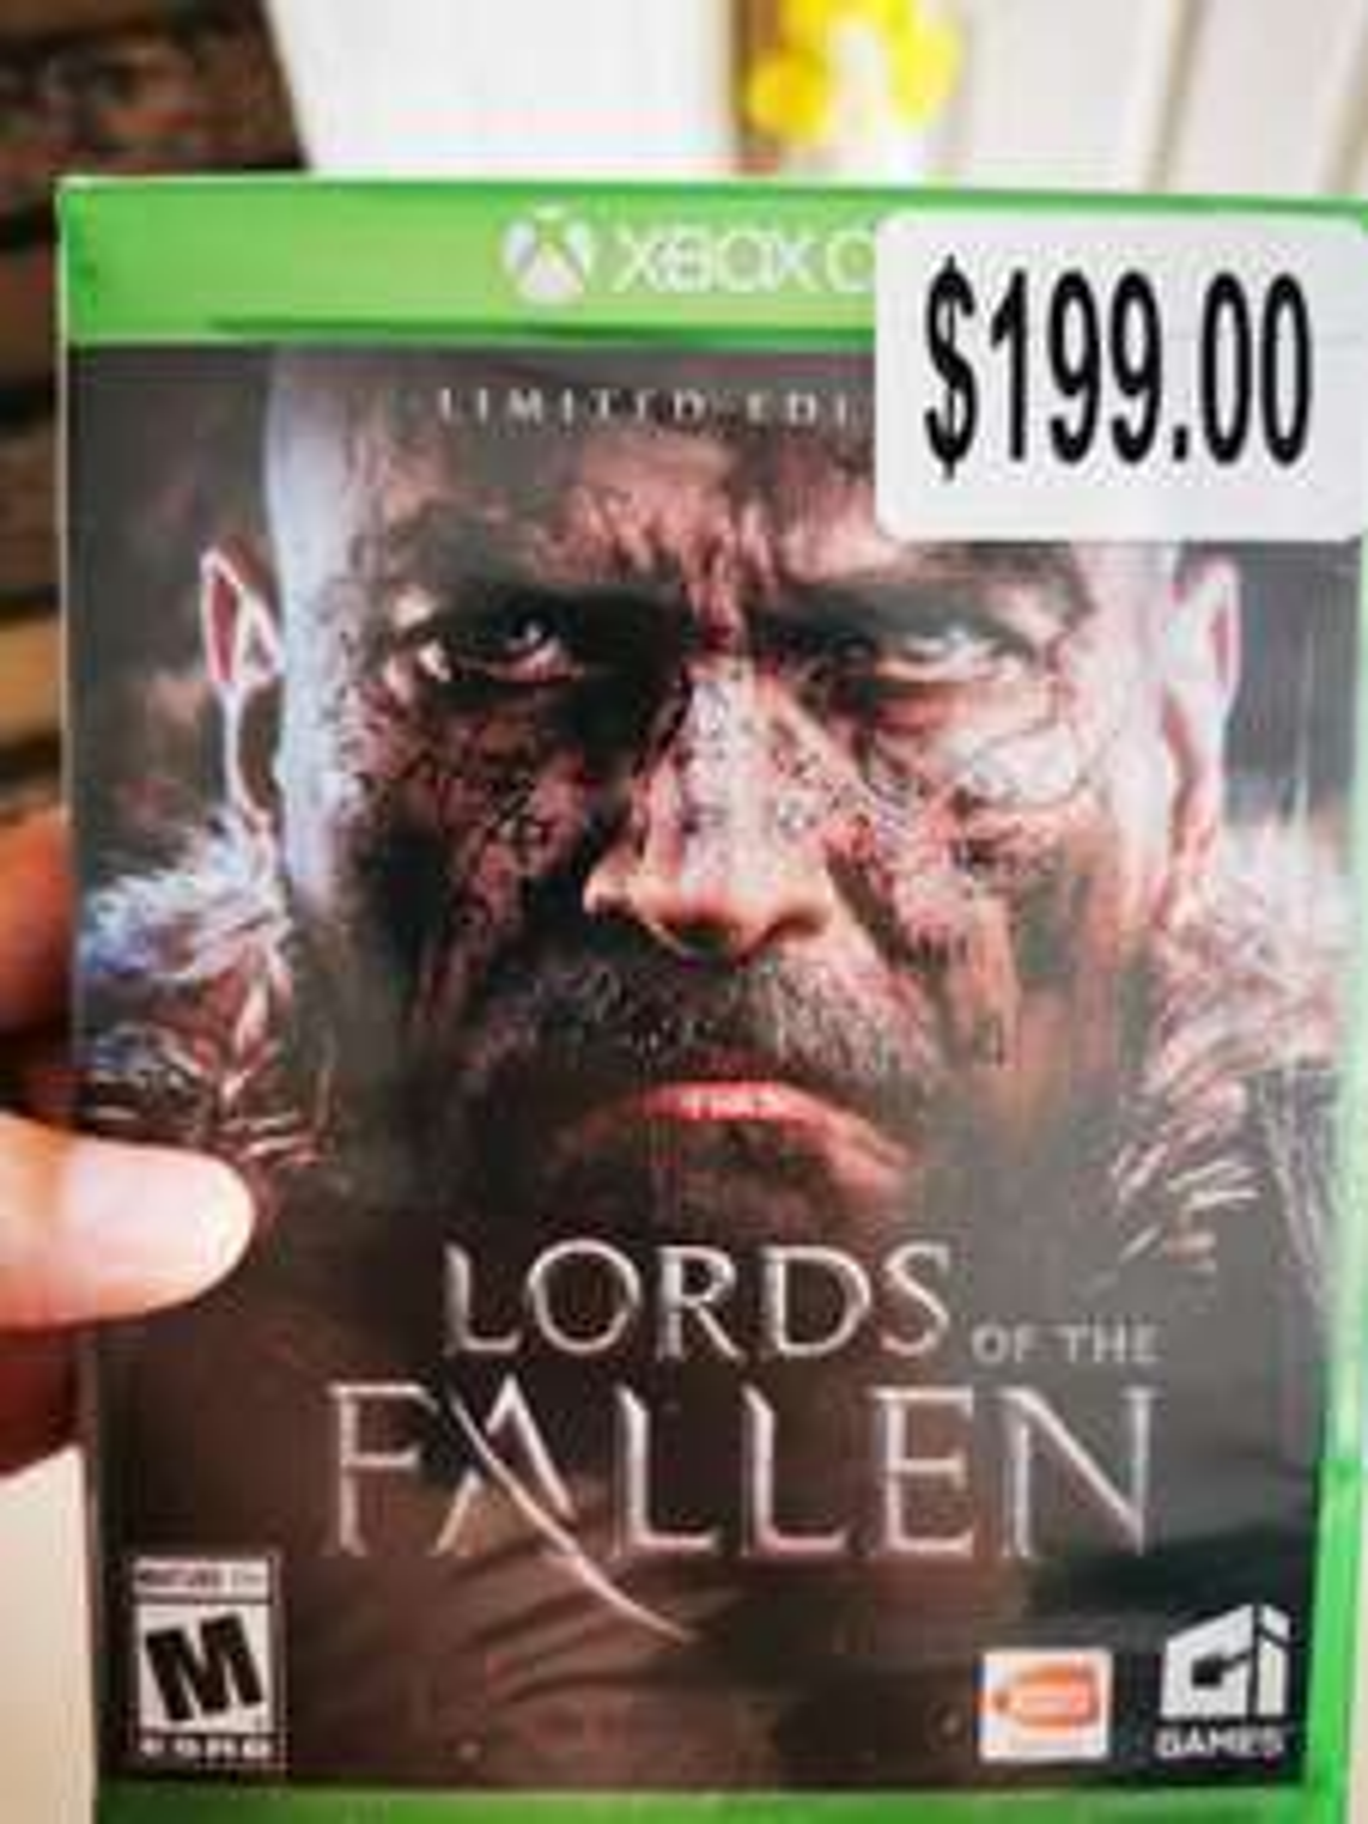 Bodega Aurrera. El Patio Tapachula. Lords of Fallen Limited Edition